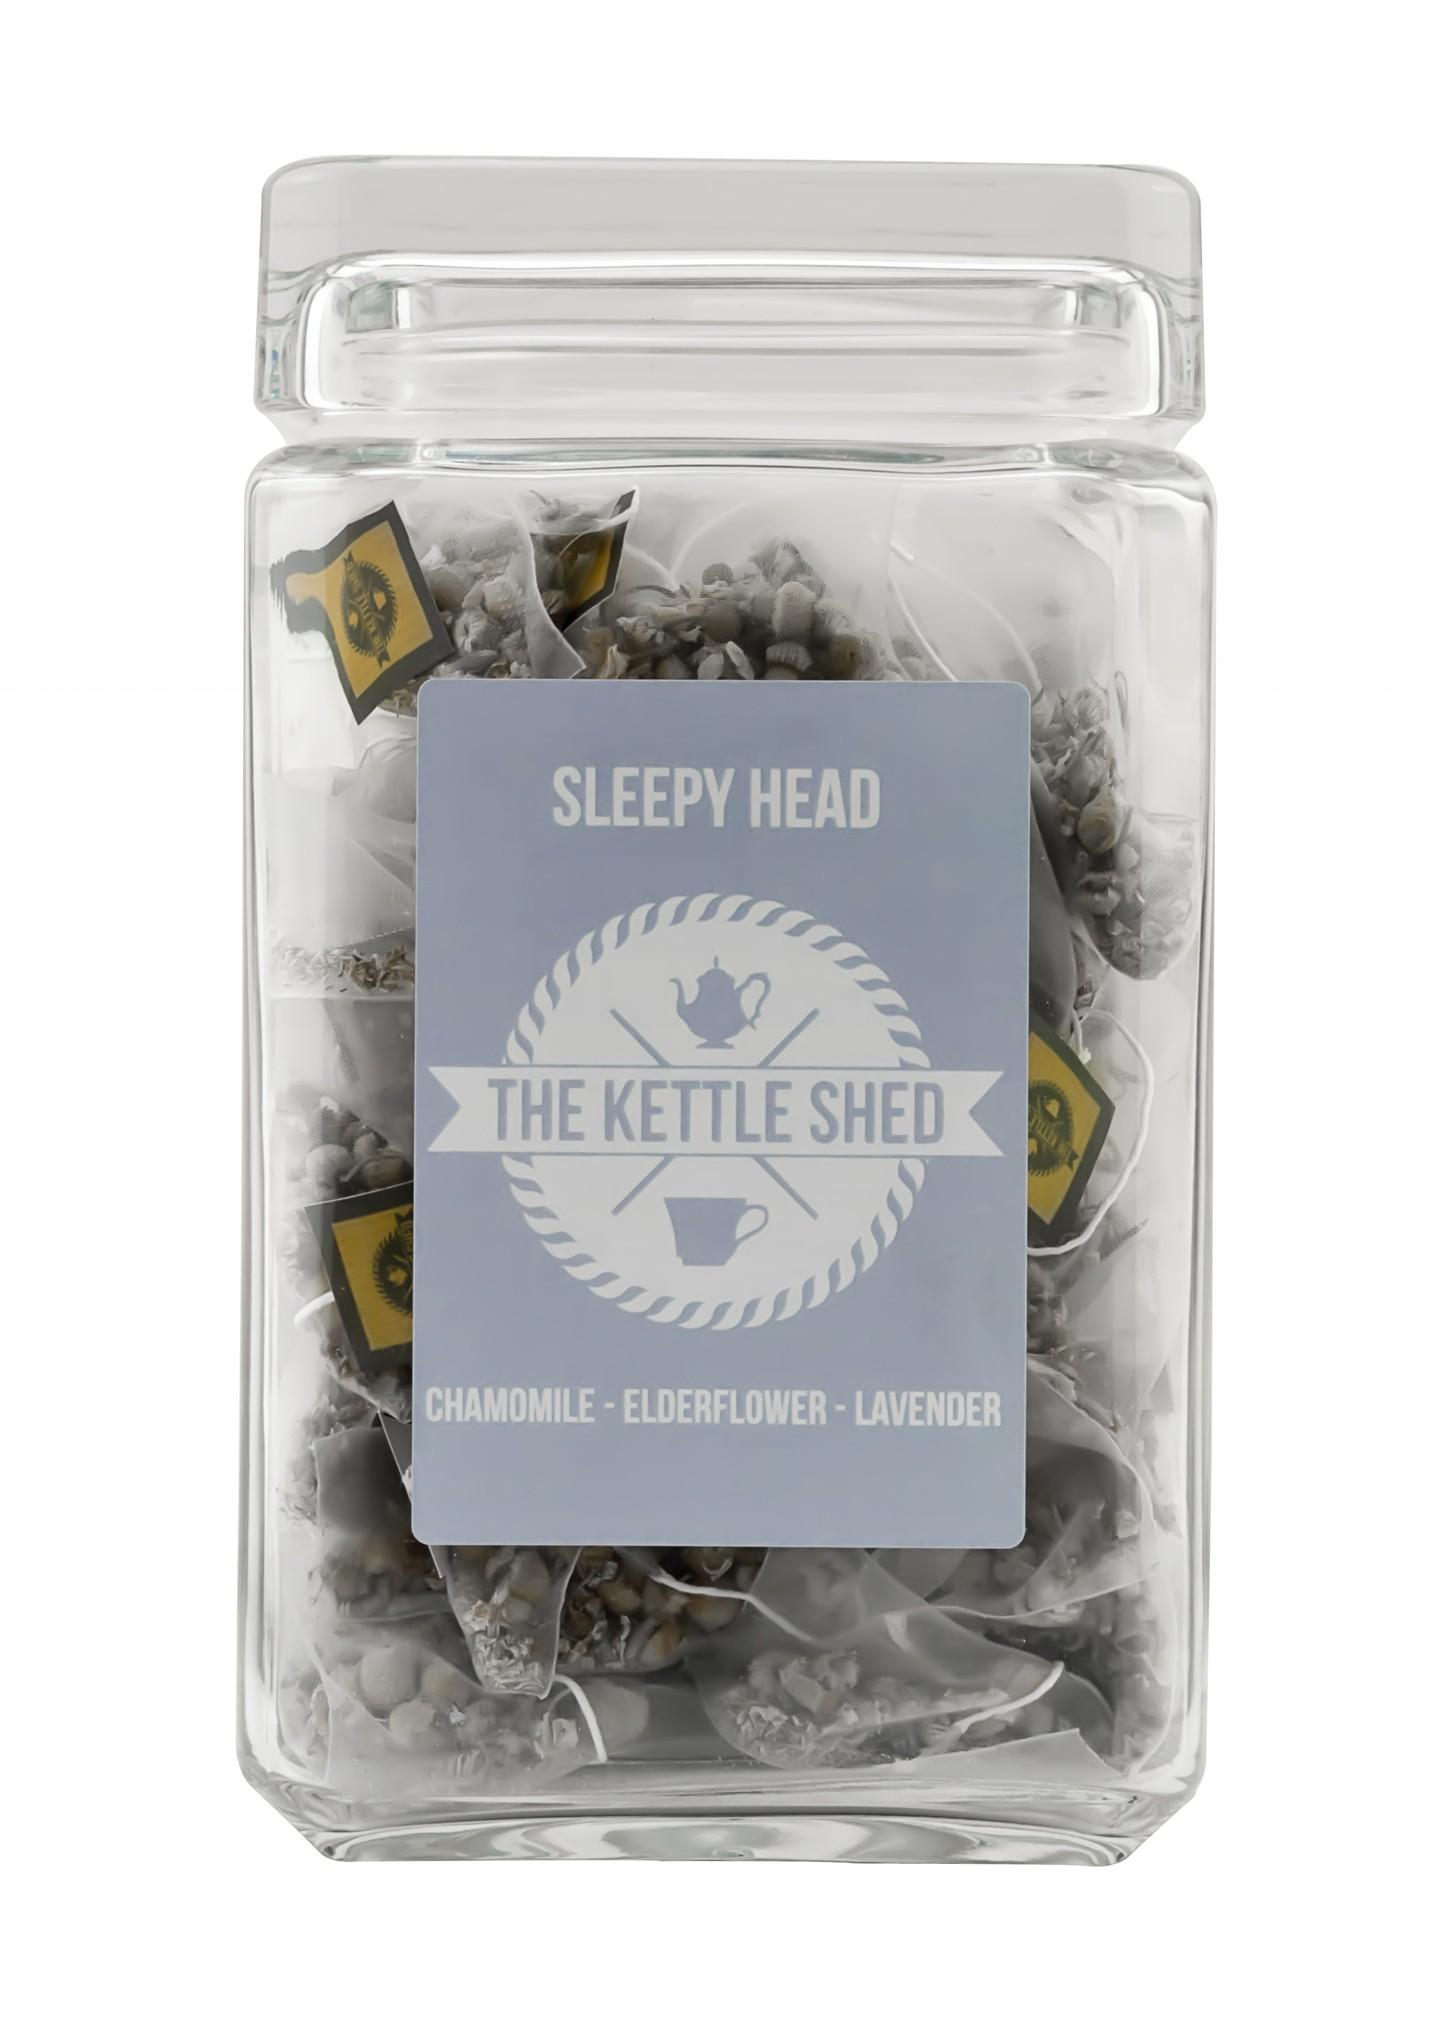 Sleepy head - Glass Display Jar (without tea)